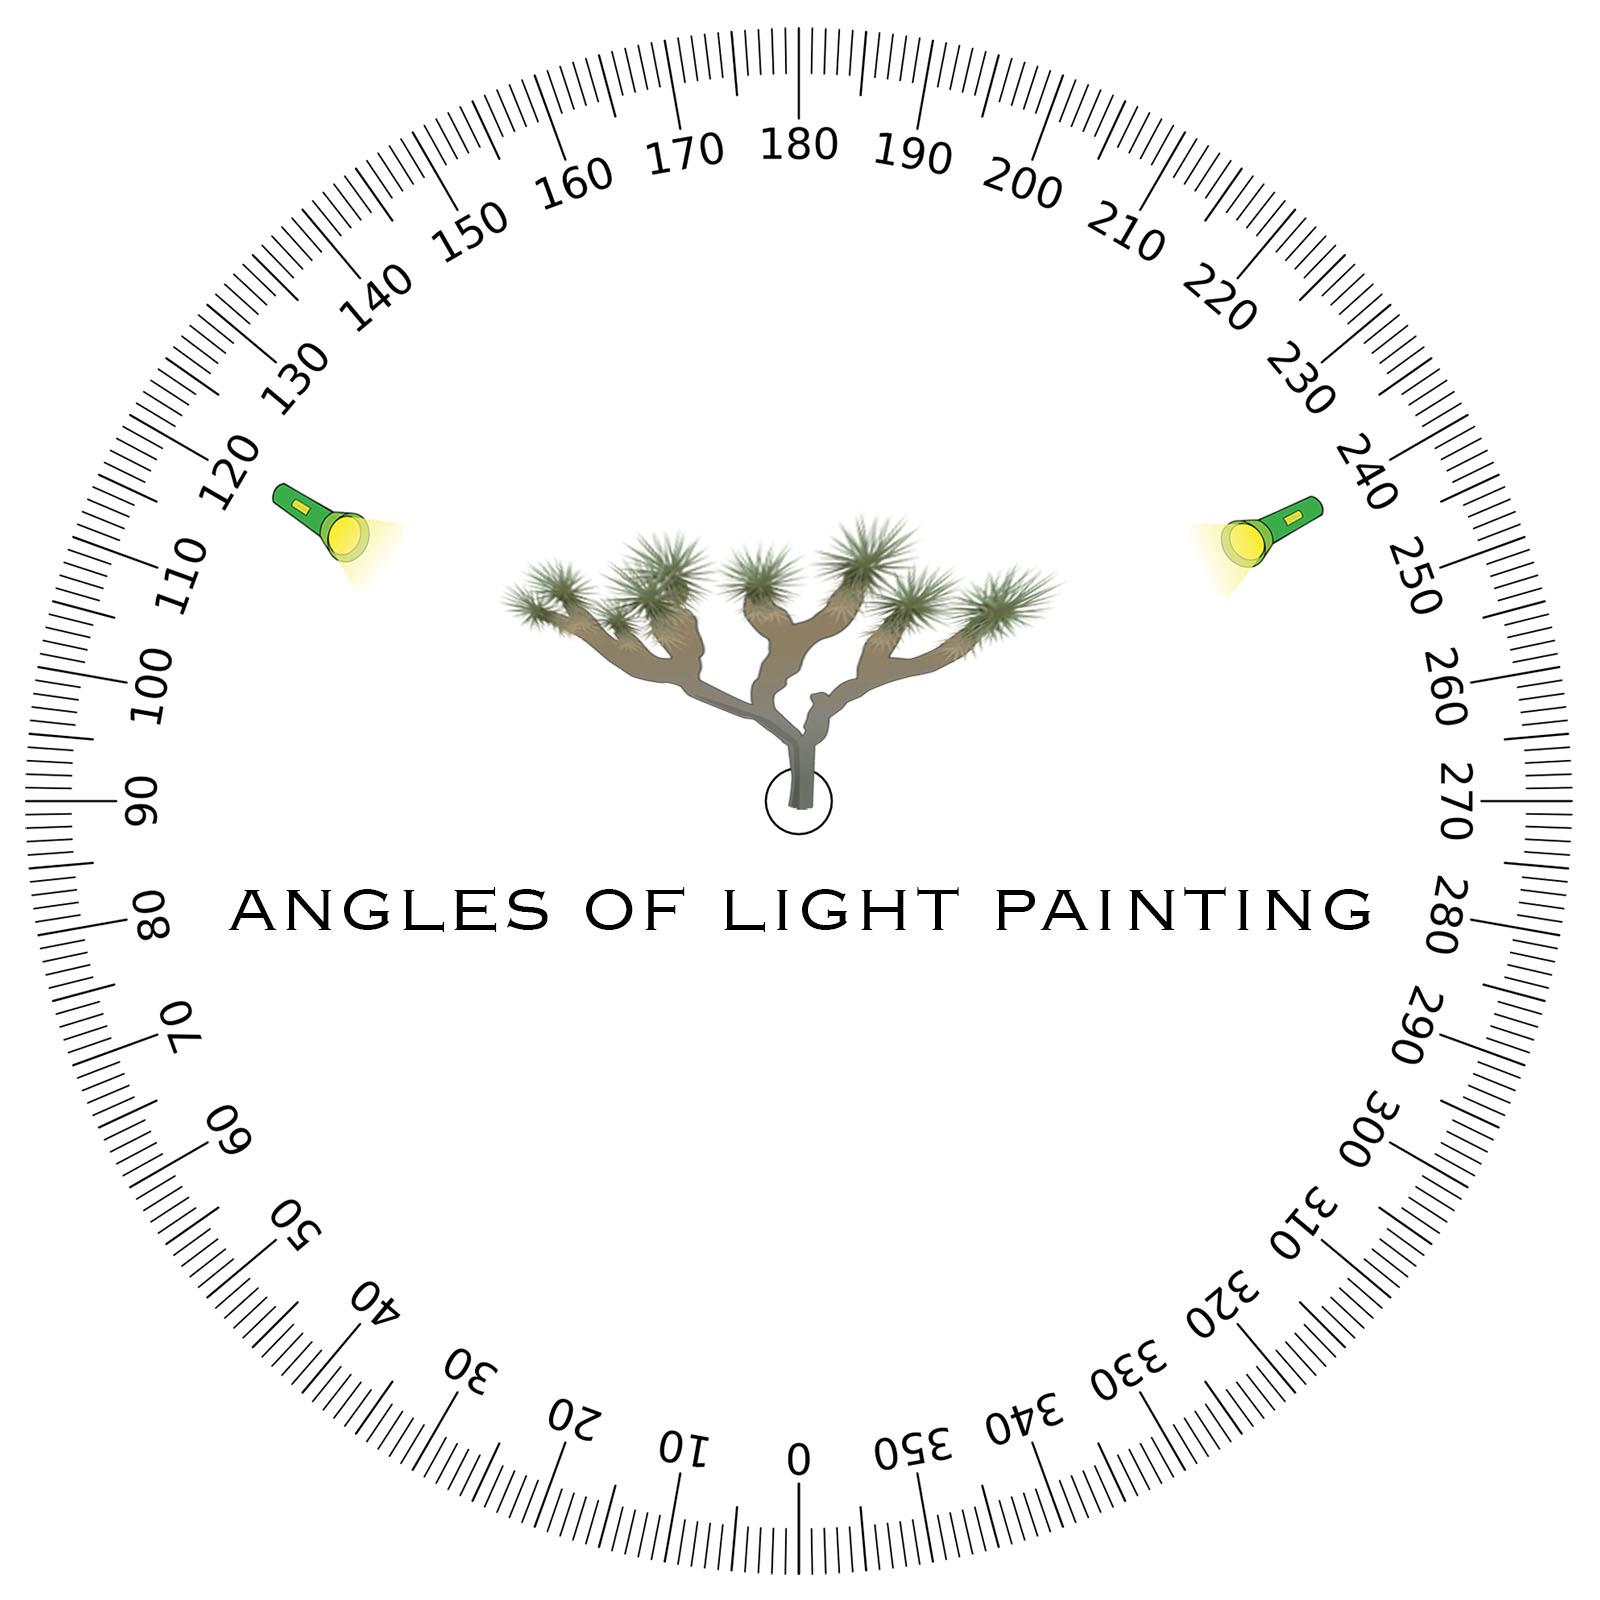 angles of light painting-joshua tree 2021-03 120-degrees-white